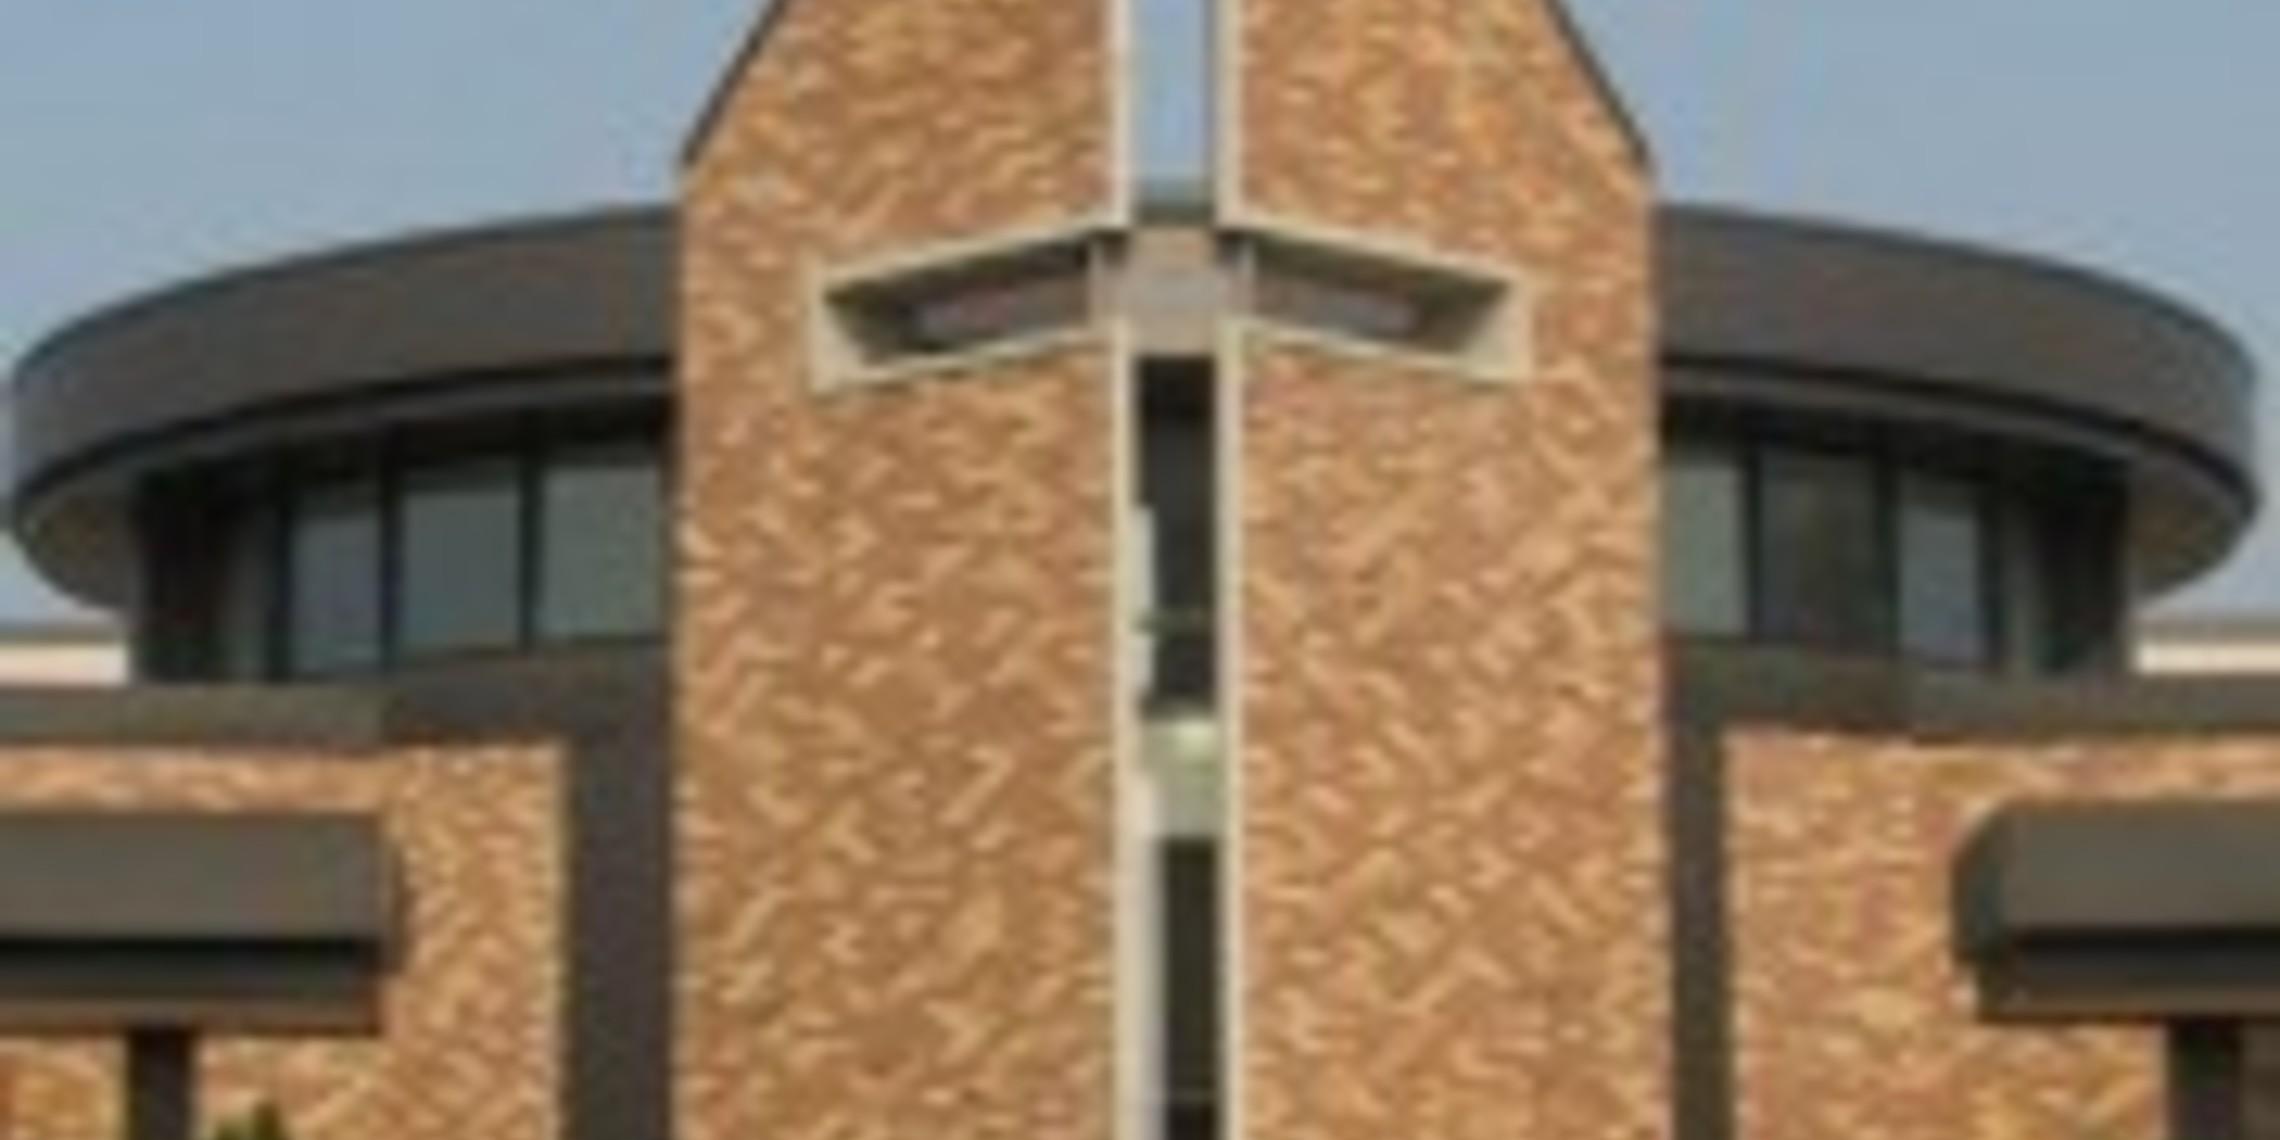 Parish History New Image